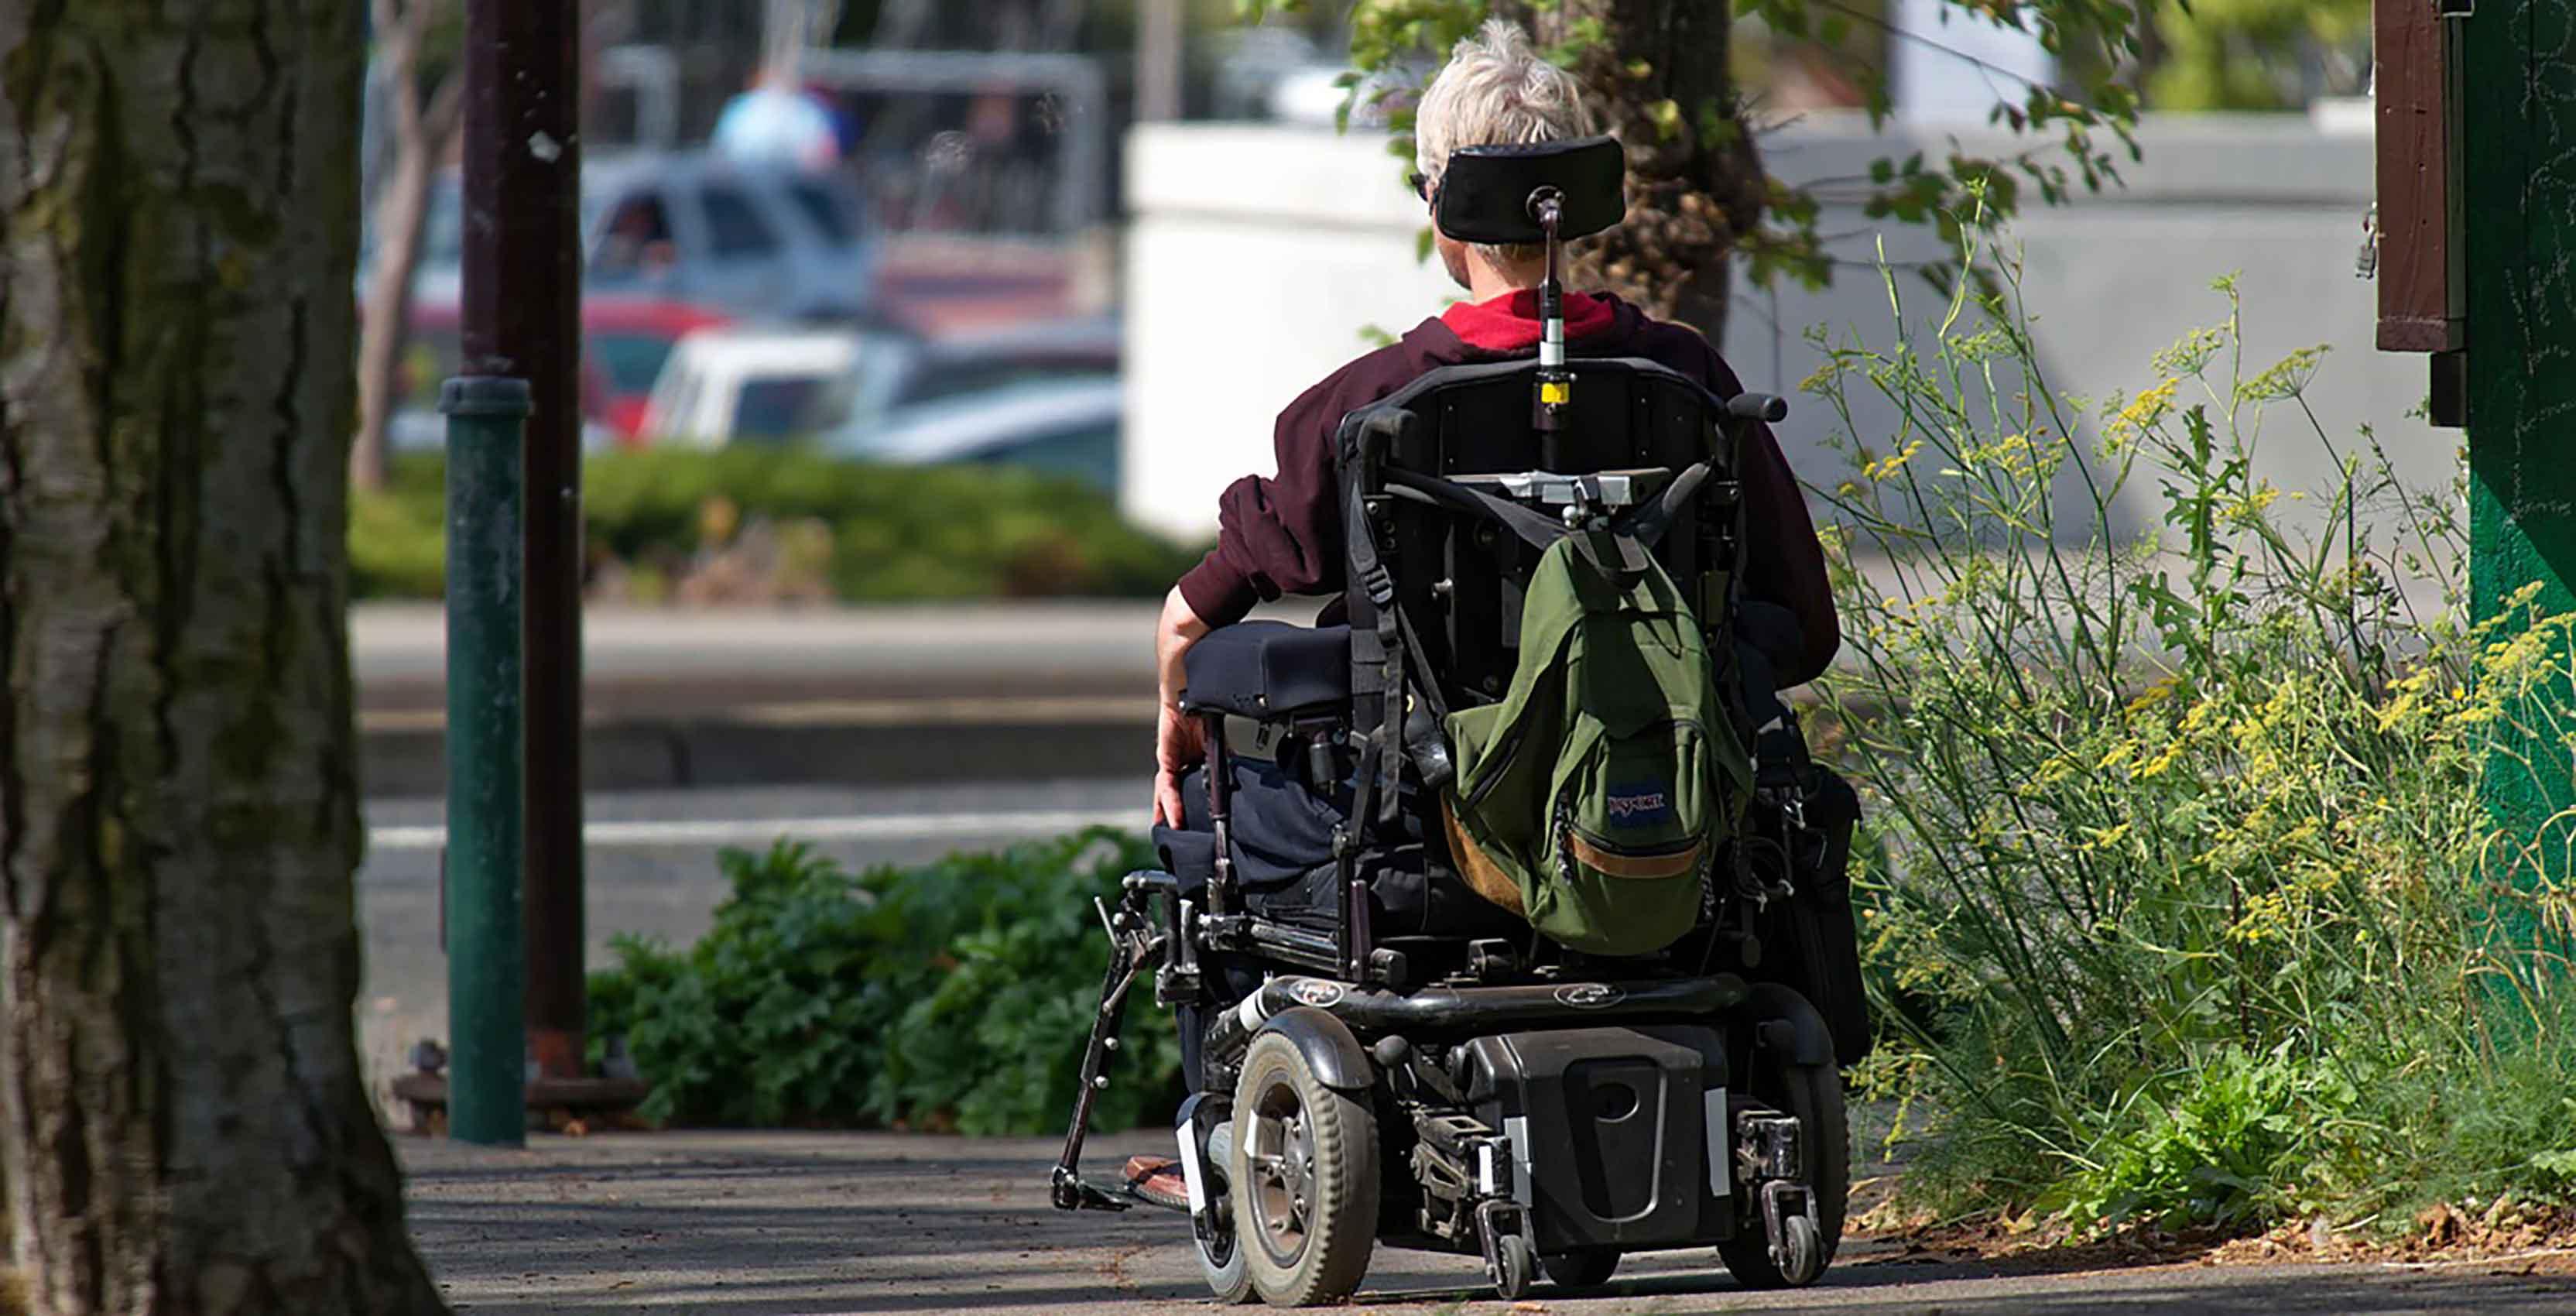 Man in motorized wheelchair